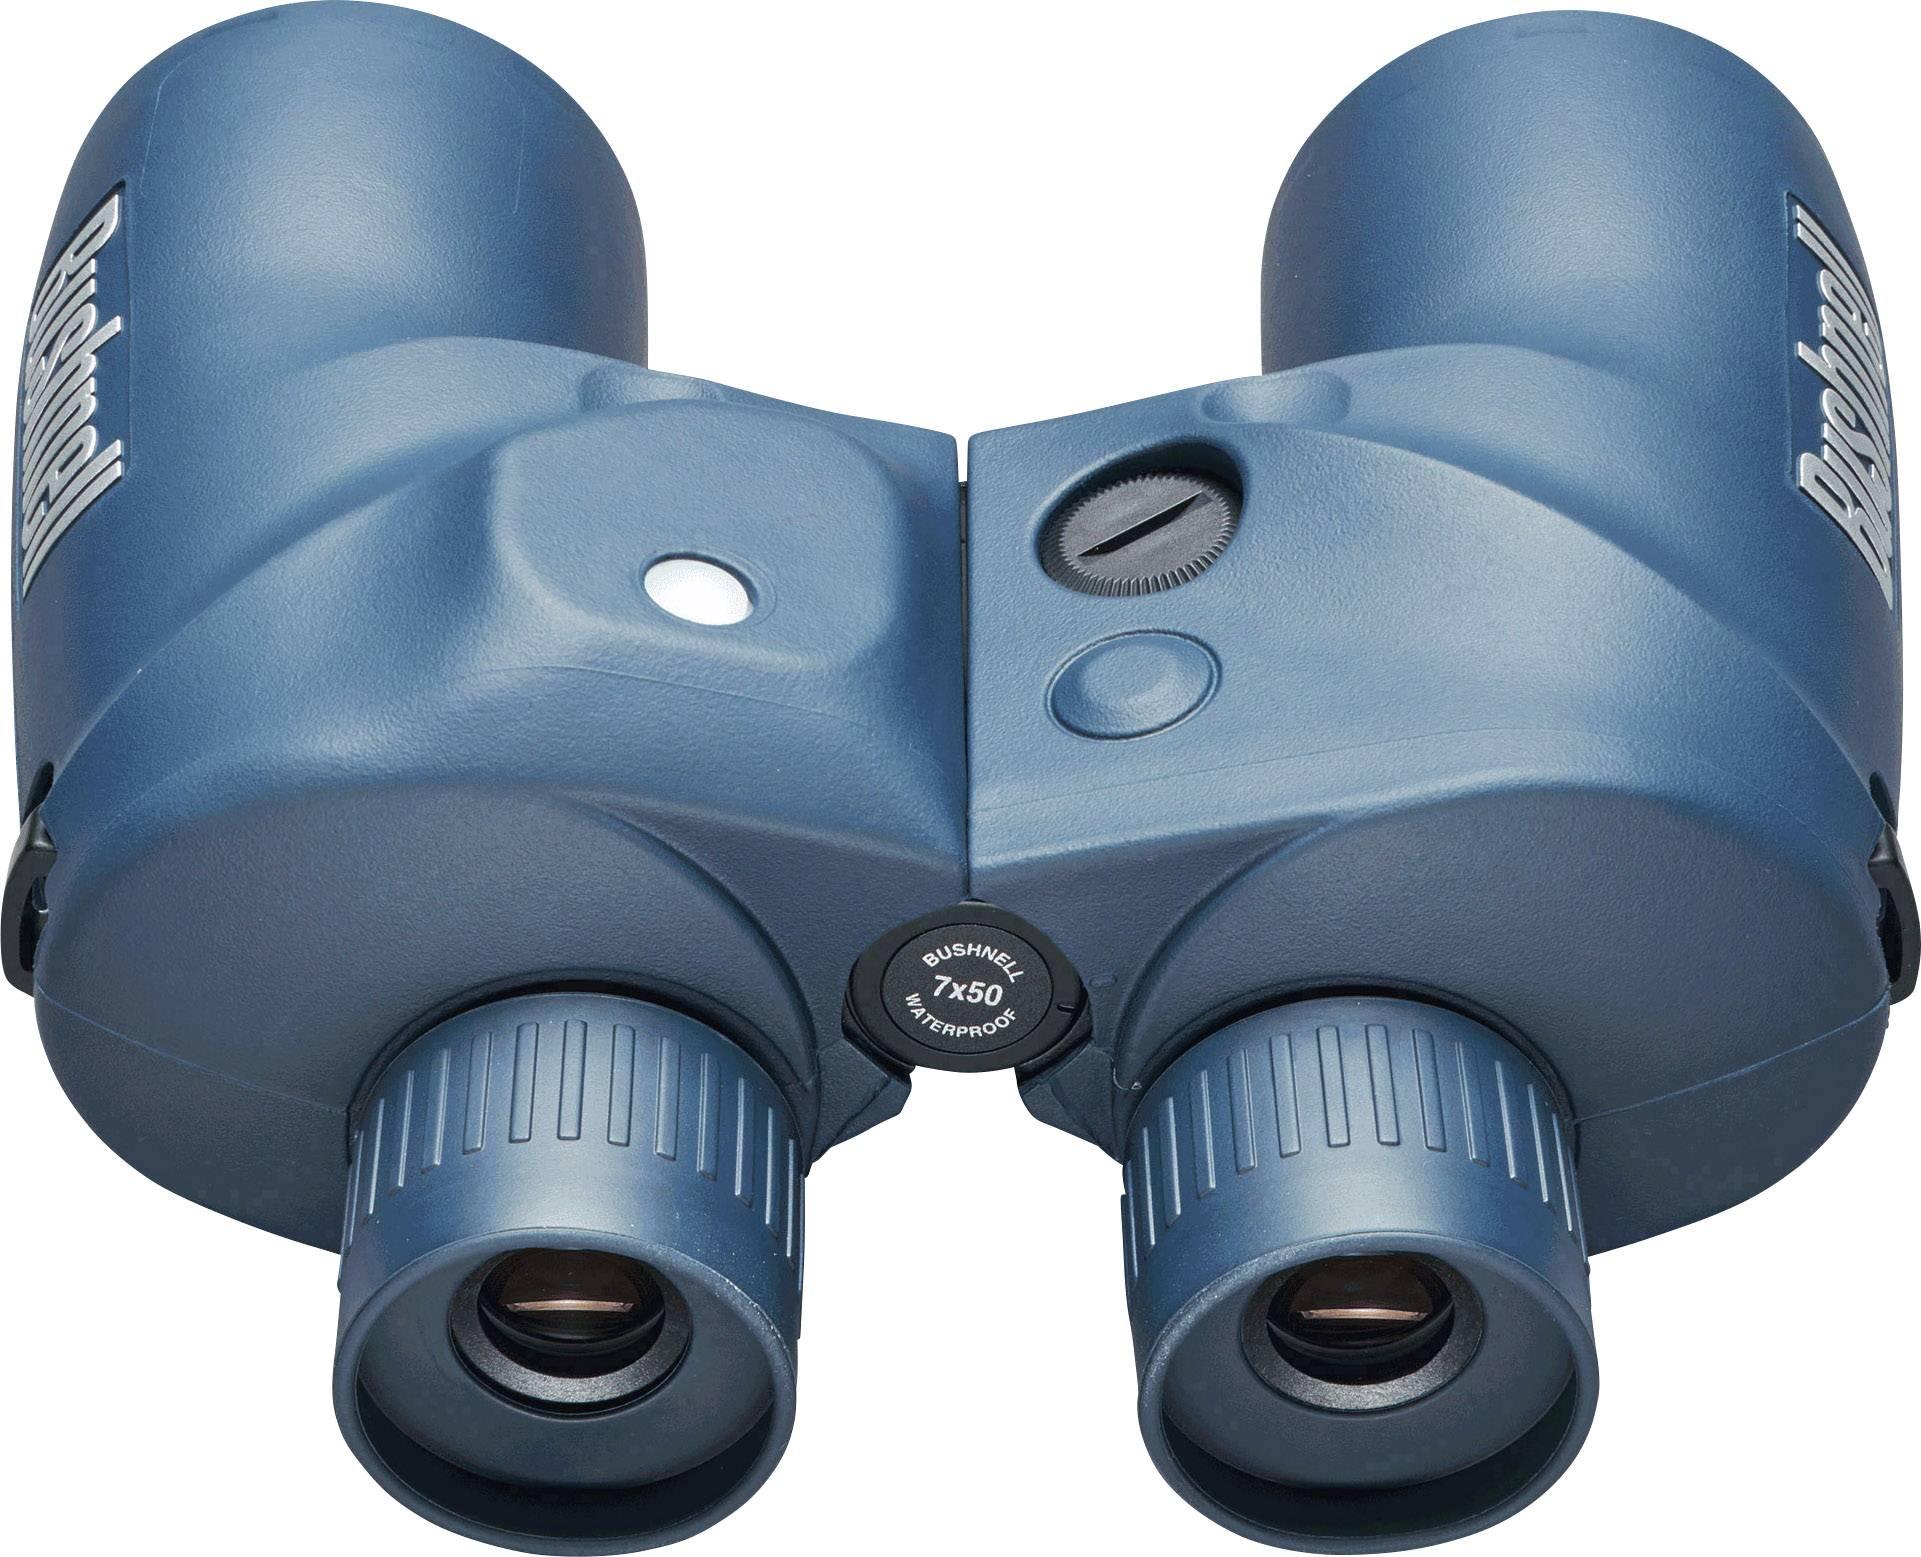 Bushnell marine fernglas marine kompass mm porro dunkelblau